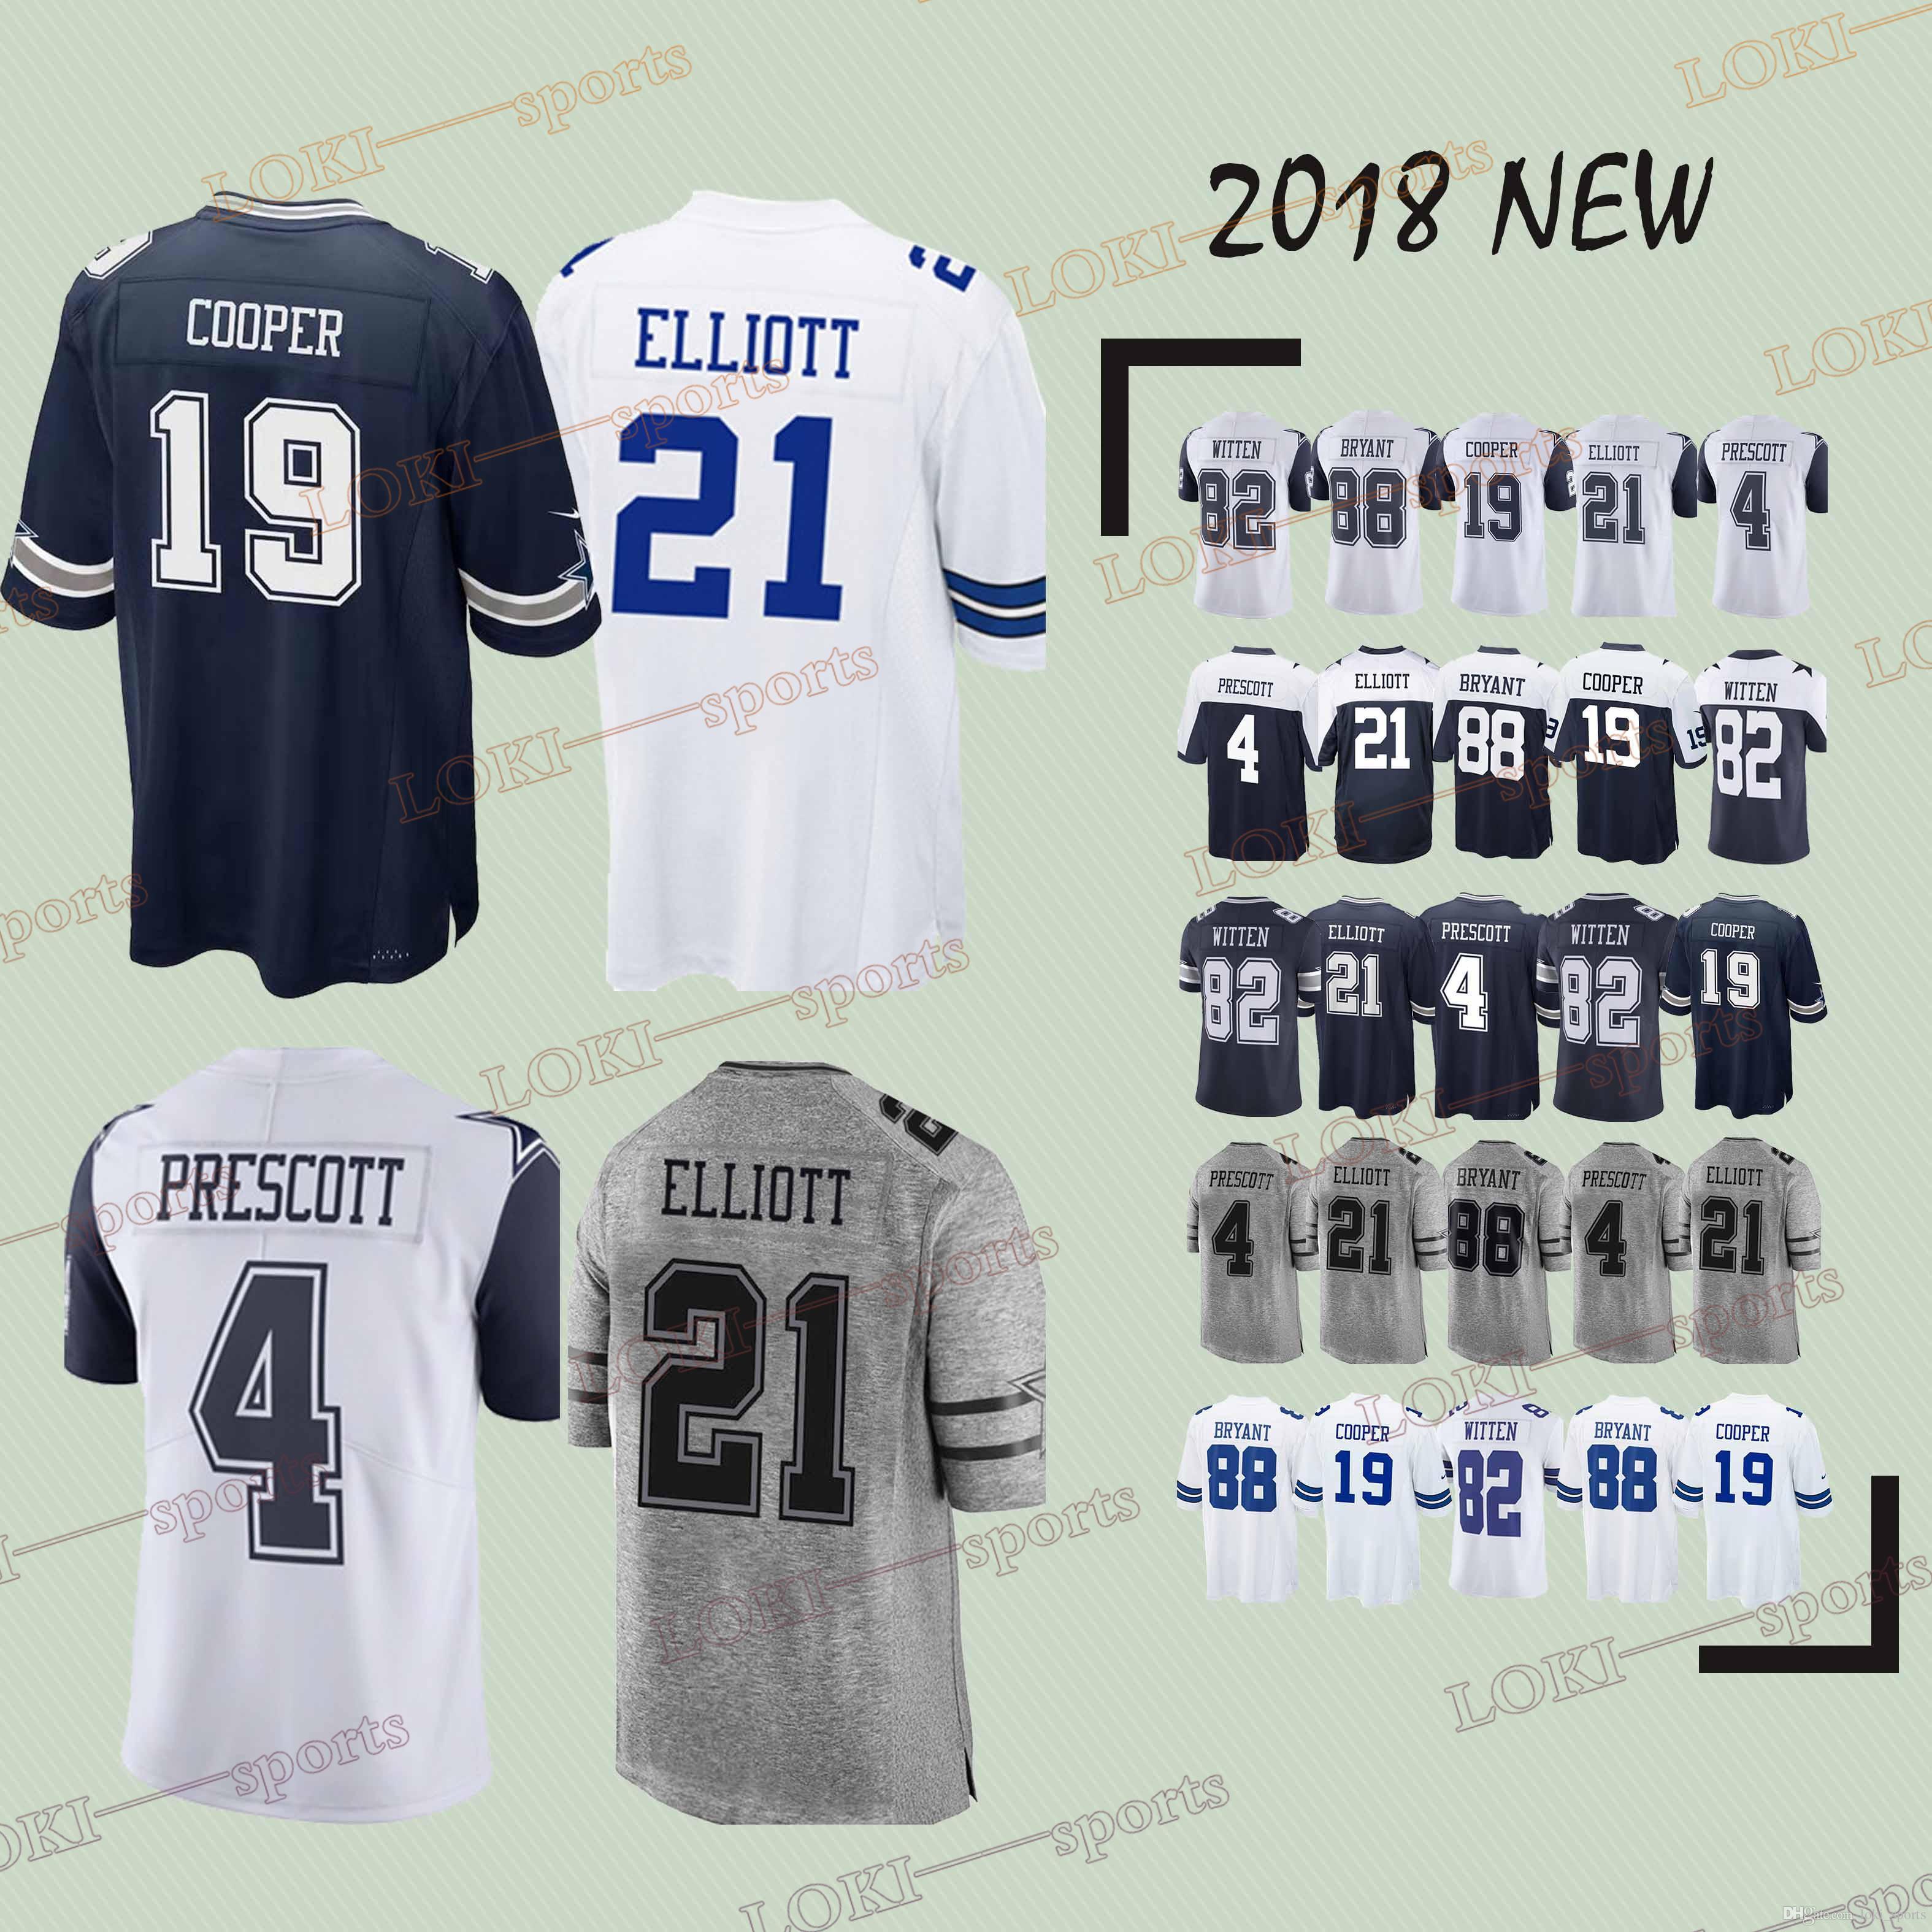 check out 37d8c 48e19 2018 Dallas Cowboys Jerseys 21 Ezekiel Elliott 19 Amari Cooper 55 Leighton  Vander Esch 88 Dez Bryant 4 DP Superior Quality 2018 2019 New Jersey From  ...